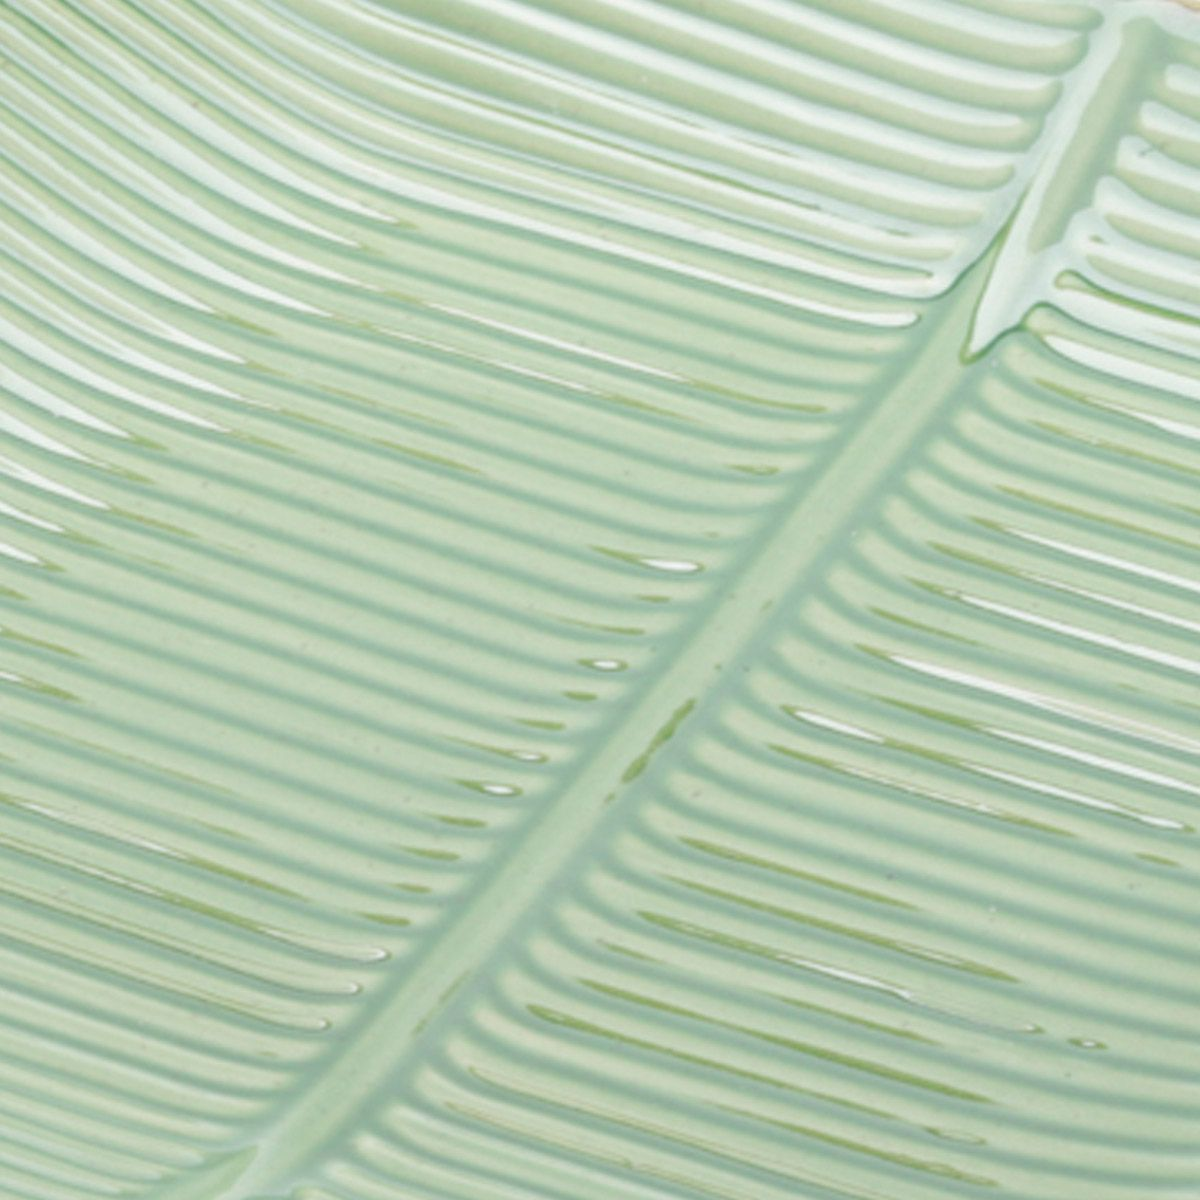 Prato decorativo 27 x 27 cm de cerâmica verde Banana Leaf Lyor - L4138